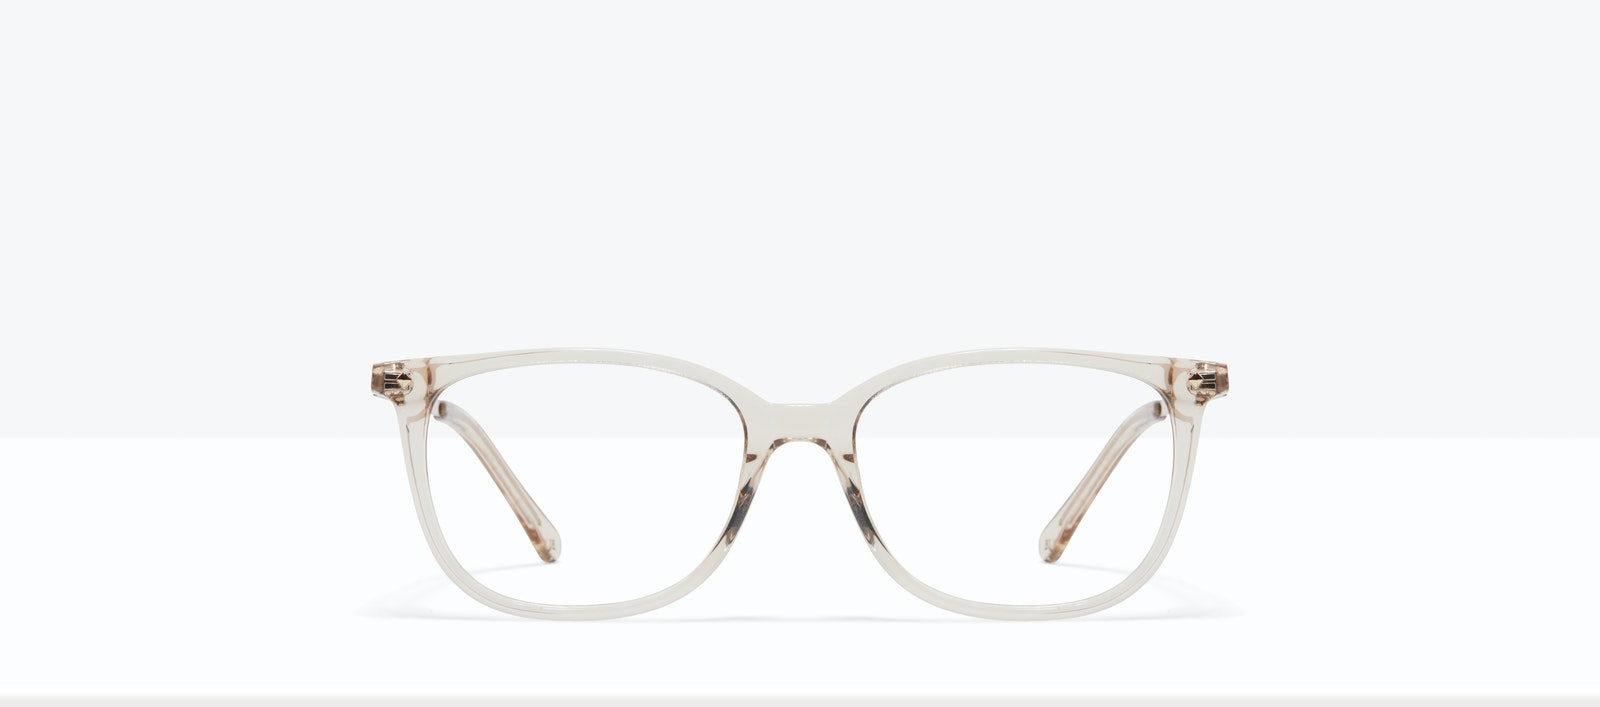 Affordable Fashion Glasses Rectangle Square Eyeglasses Women Refine M Blond Front